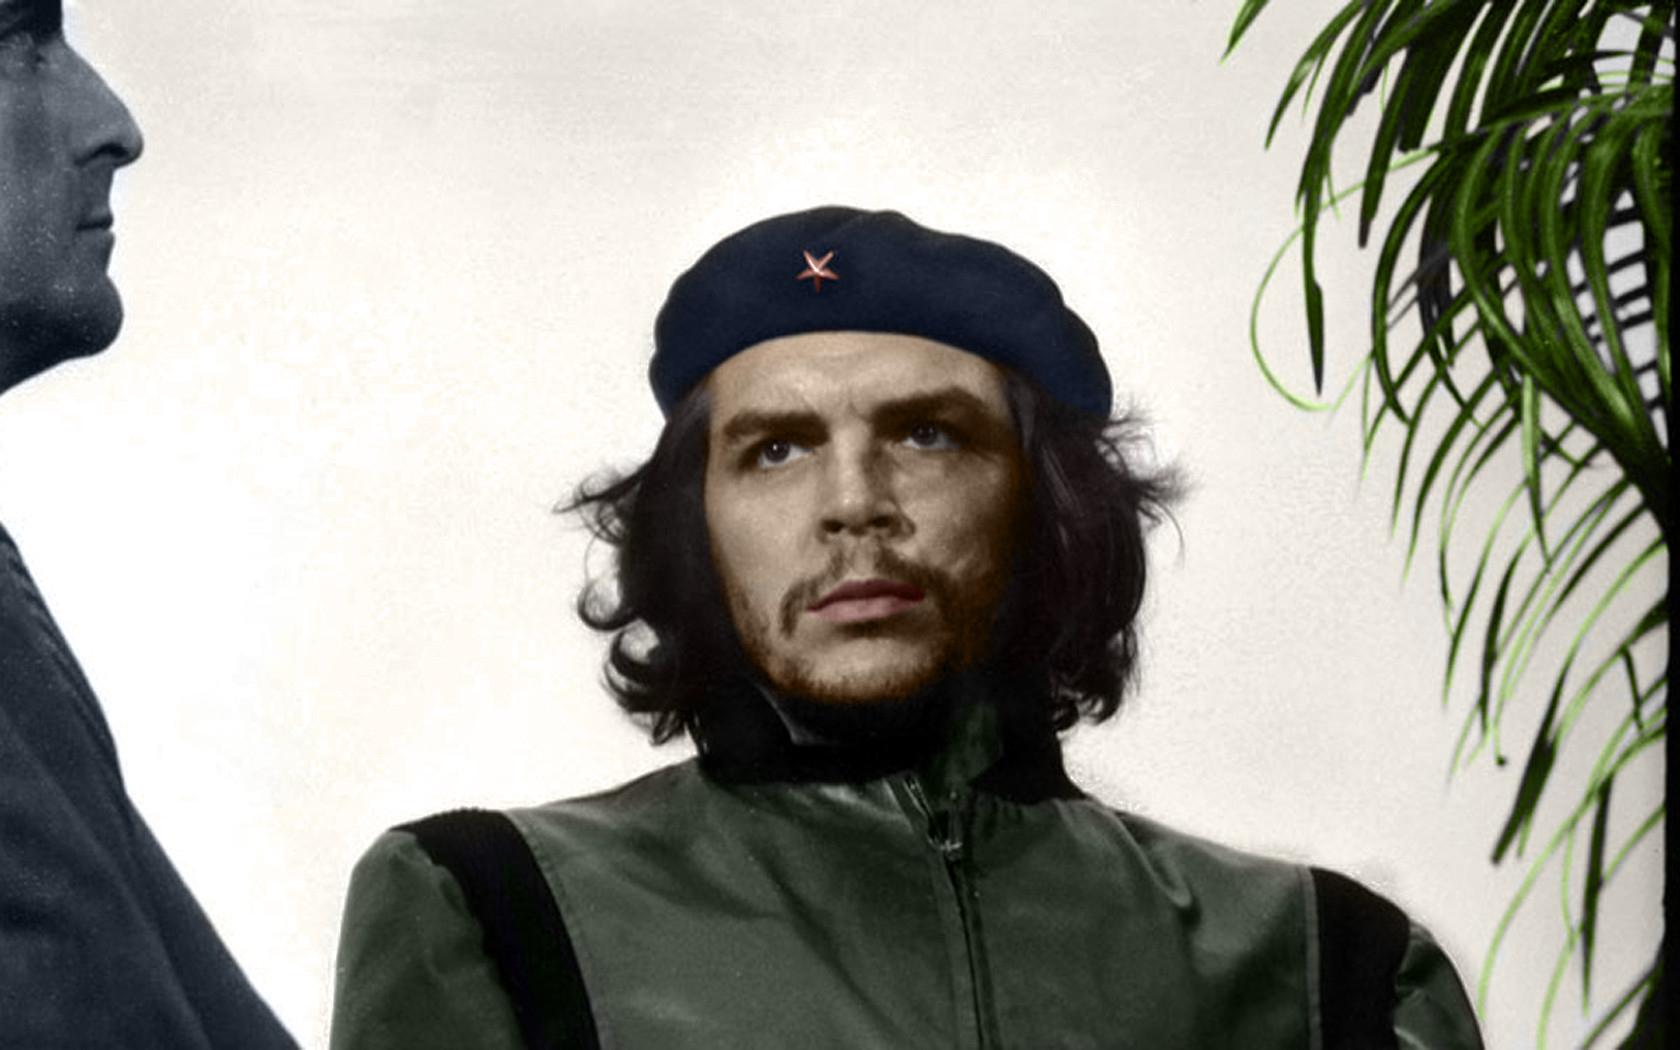 People 1680x1050 Che Guevara colorized photos hat beards men historic